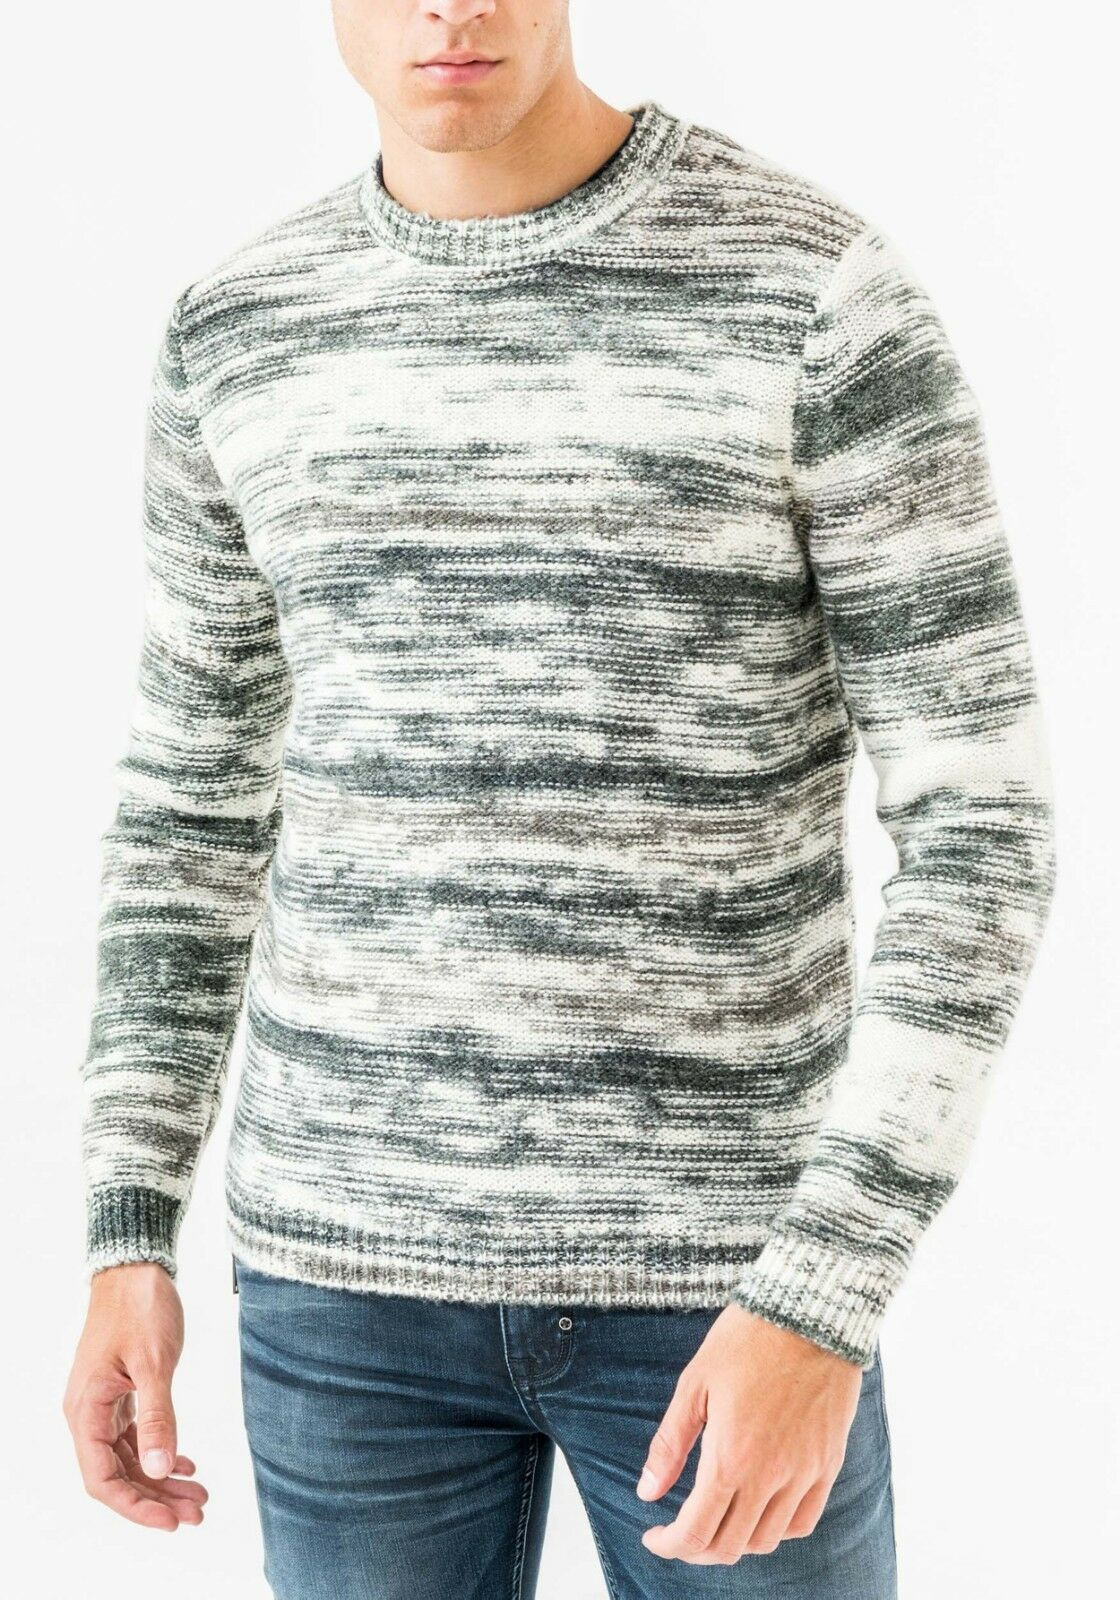 Maglia antony girocollo morato effetto melange  girocollo antony in mista lana mohair.2019 0192ea